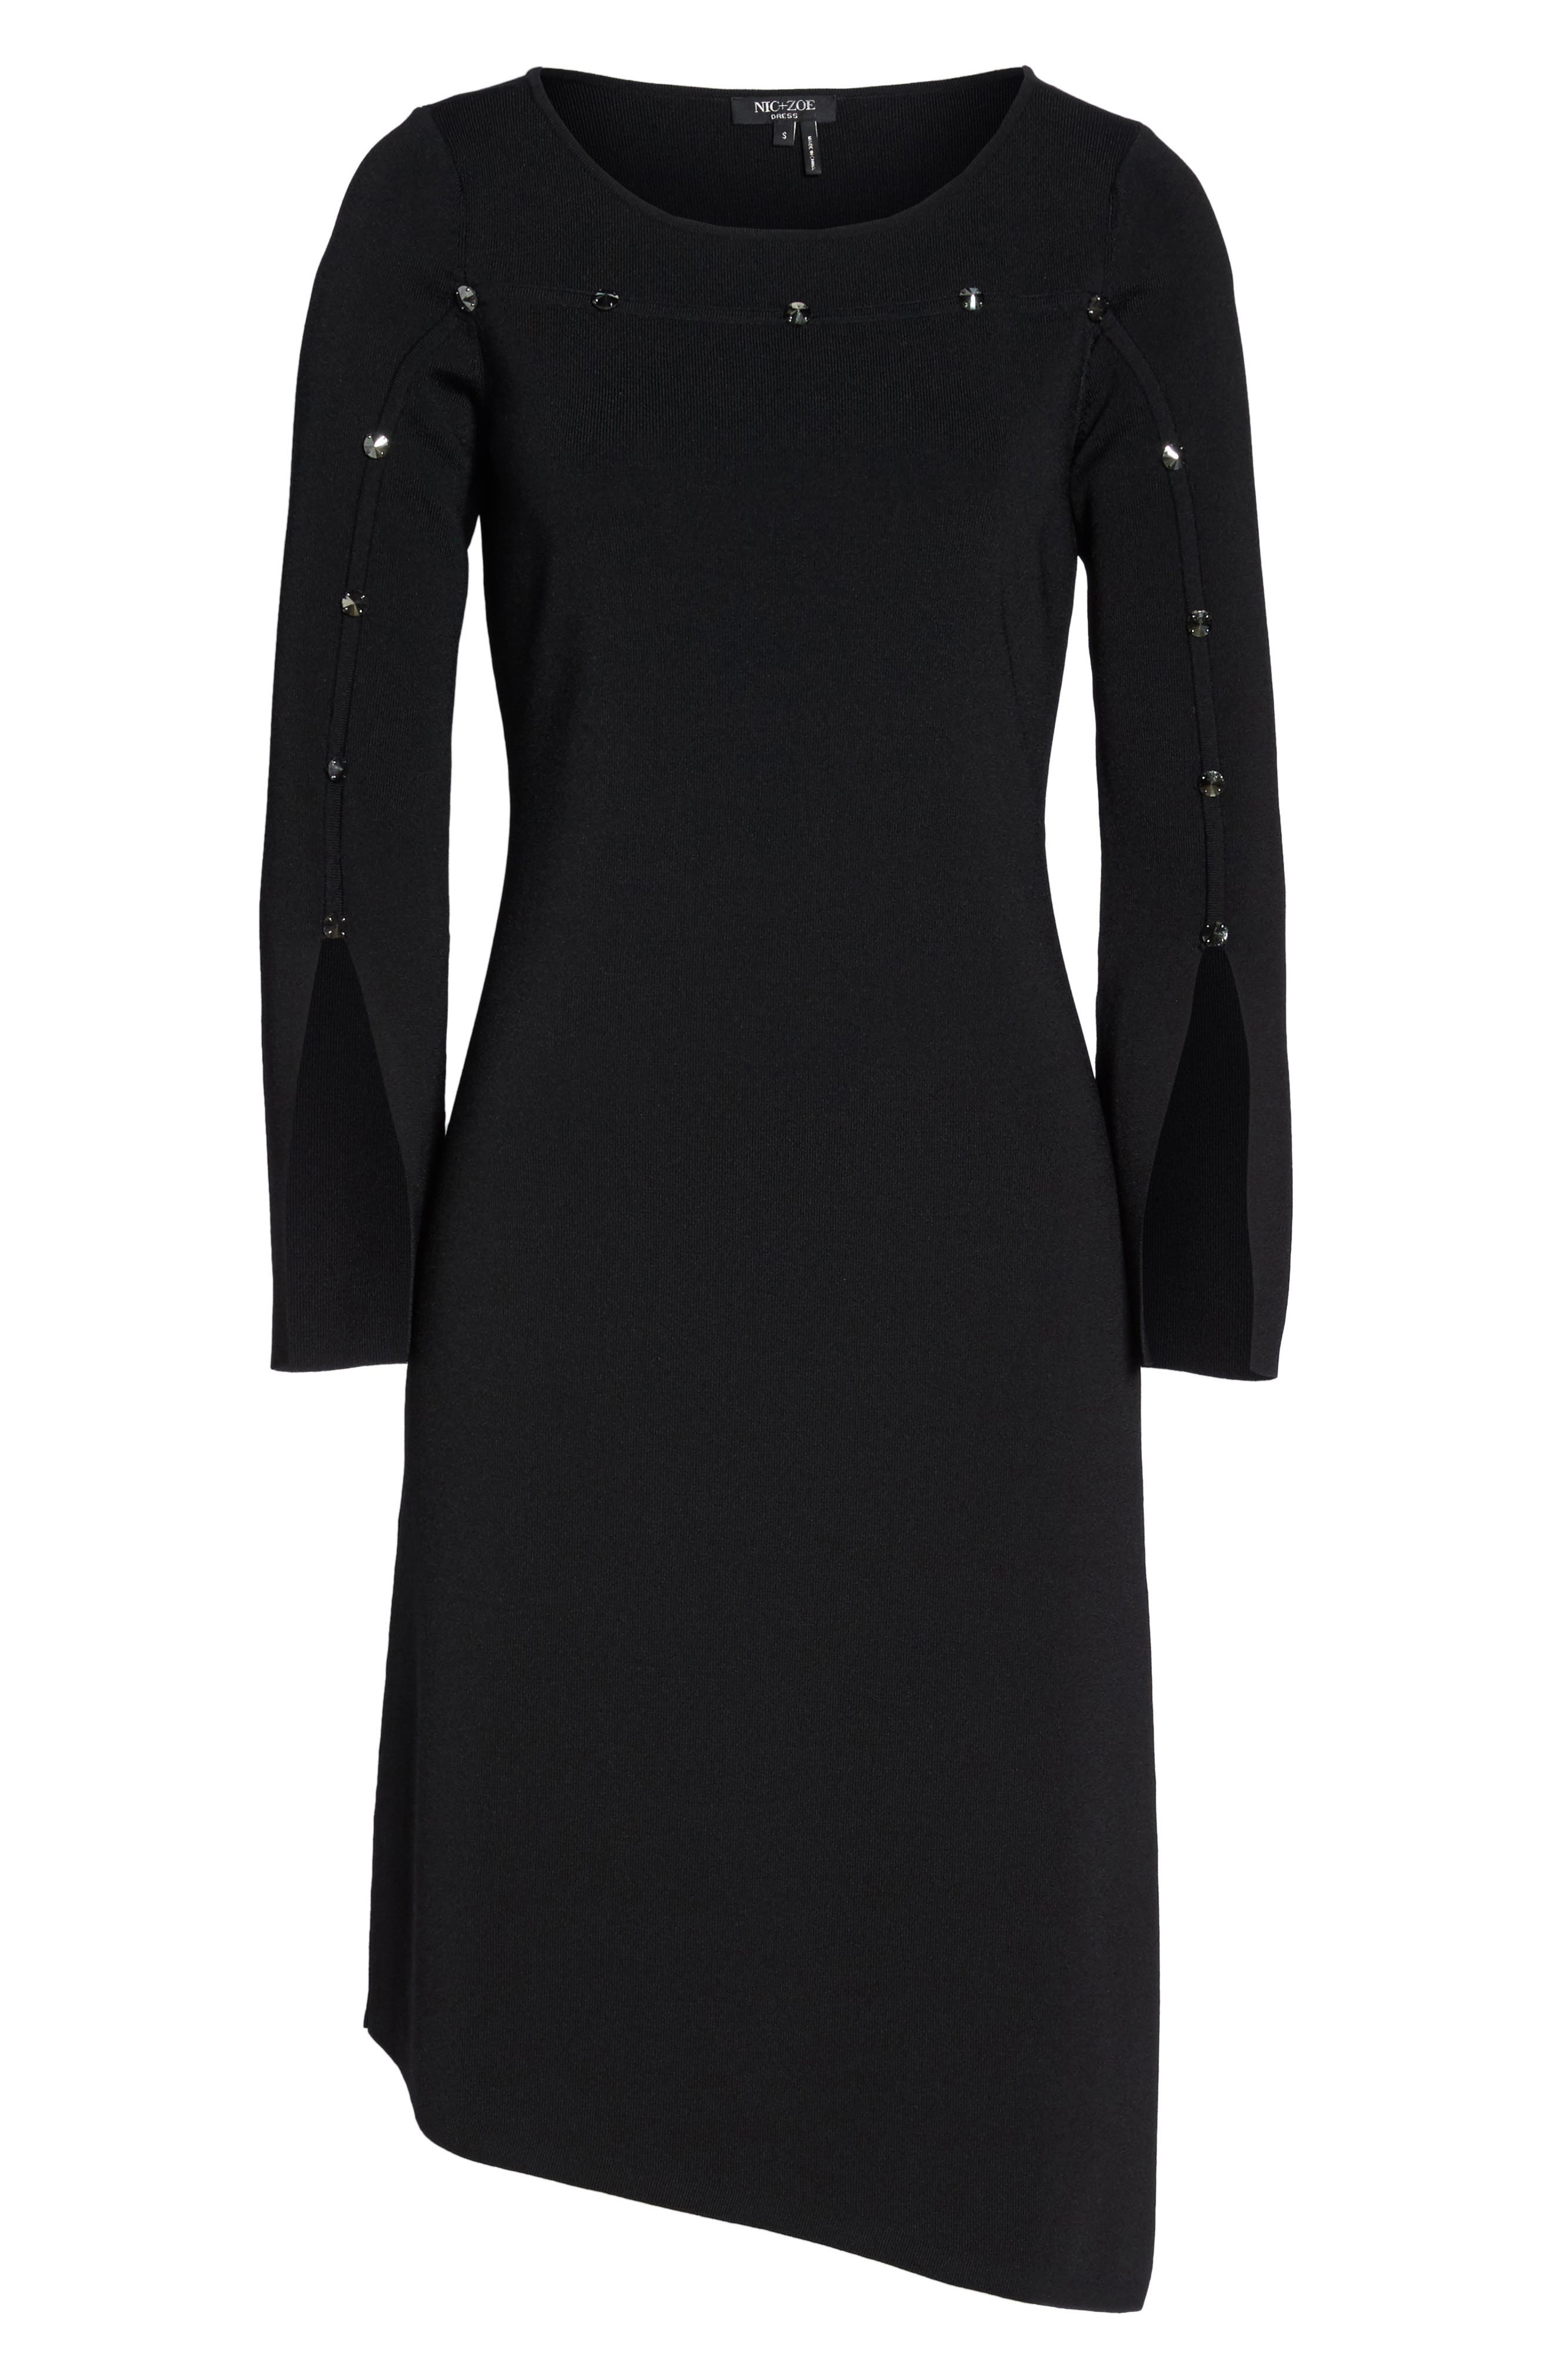 Studded Asymmetrical Dress,                             Alternate thumbnail 6, color,                             Black Onyx